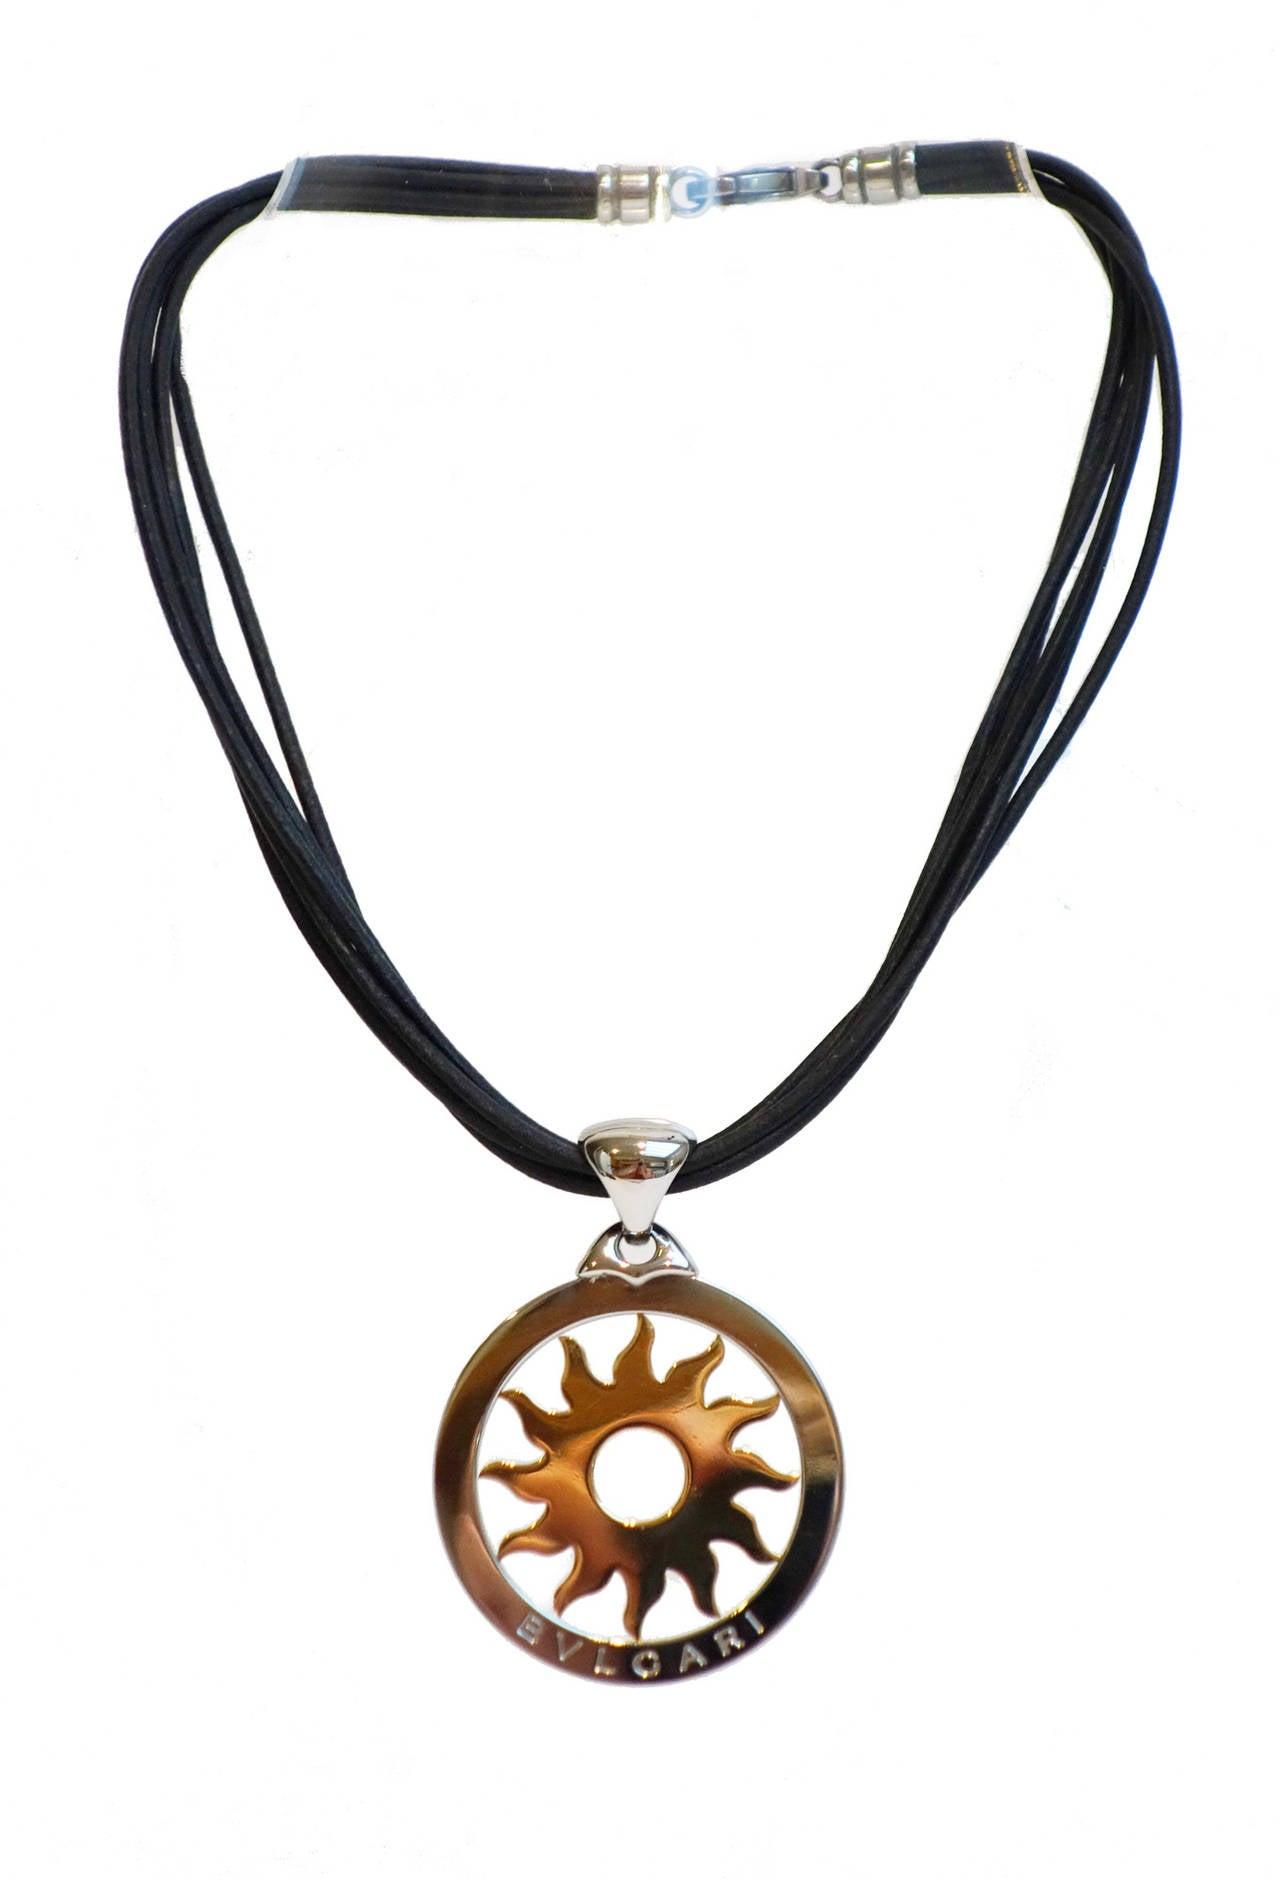 bulgari tondo stainless steel gold sun pendant necklace